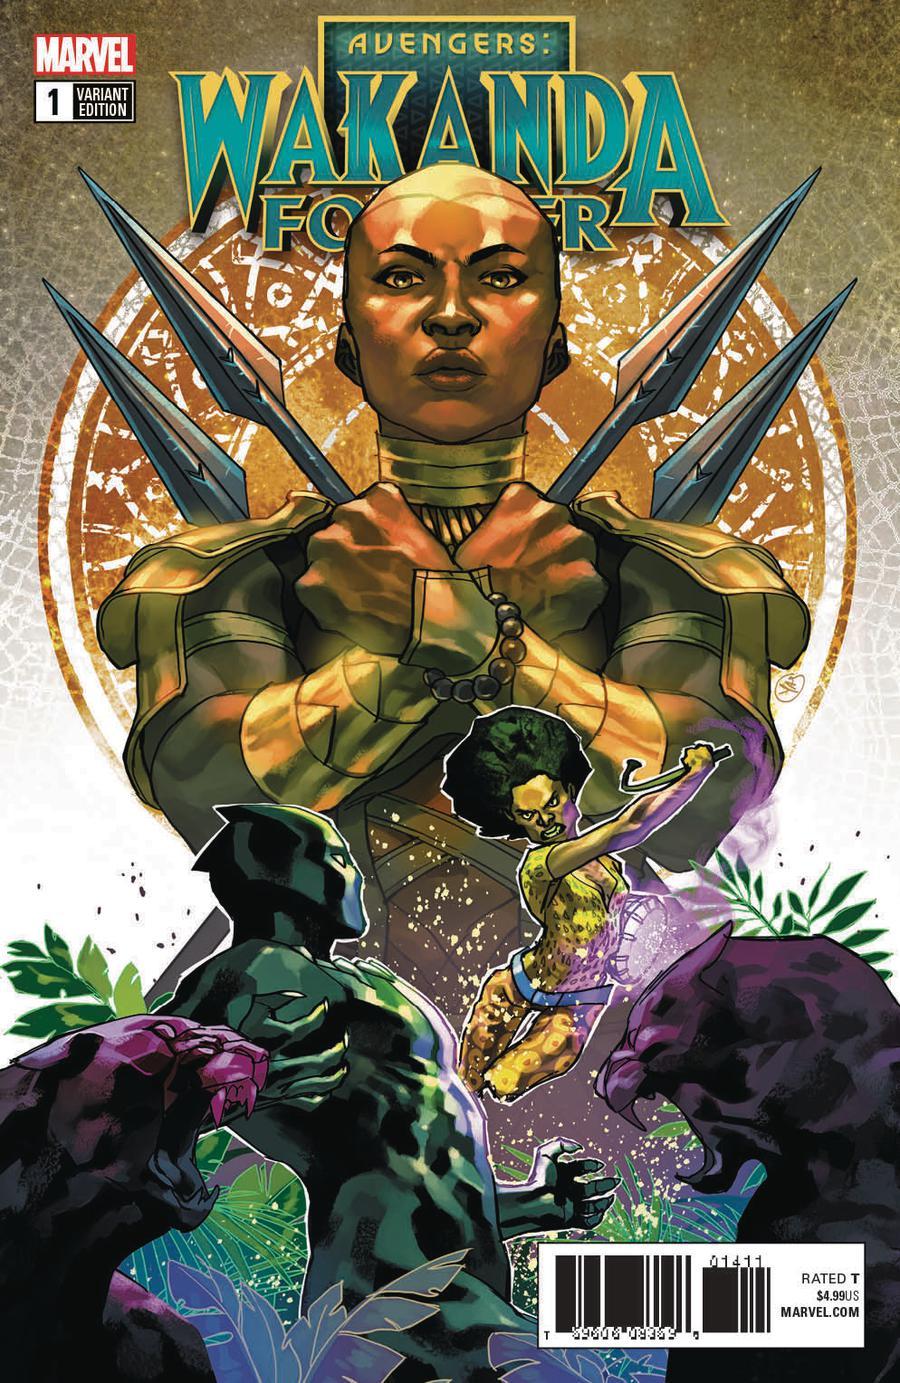 Wakanda Forever Avengers #1 Cover B Variant Yasmine Putri Connecting Cover (3 Of 3)